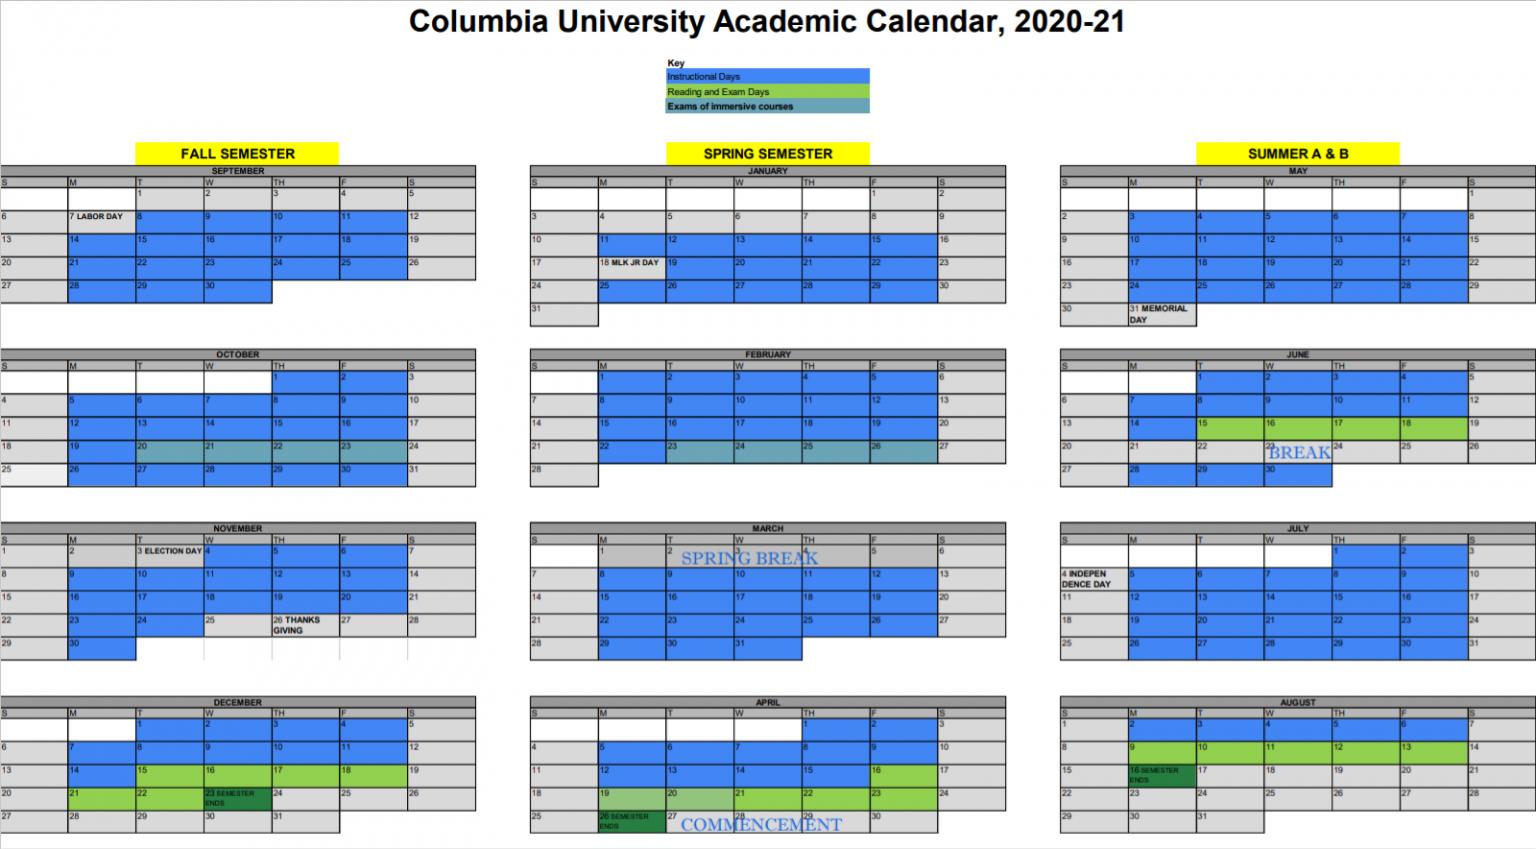 Liberty University Calendar 2022 2023.L I B E R T Y U N I V E R S I T Y O N L I N E A C A D E M I C C A L E N D A R 2 0 2 1 2 0 2 2 Zonealarm Results